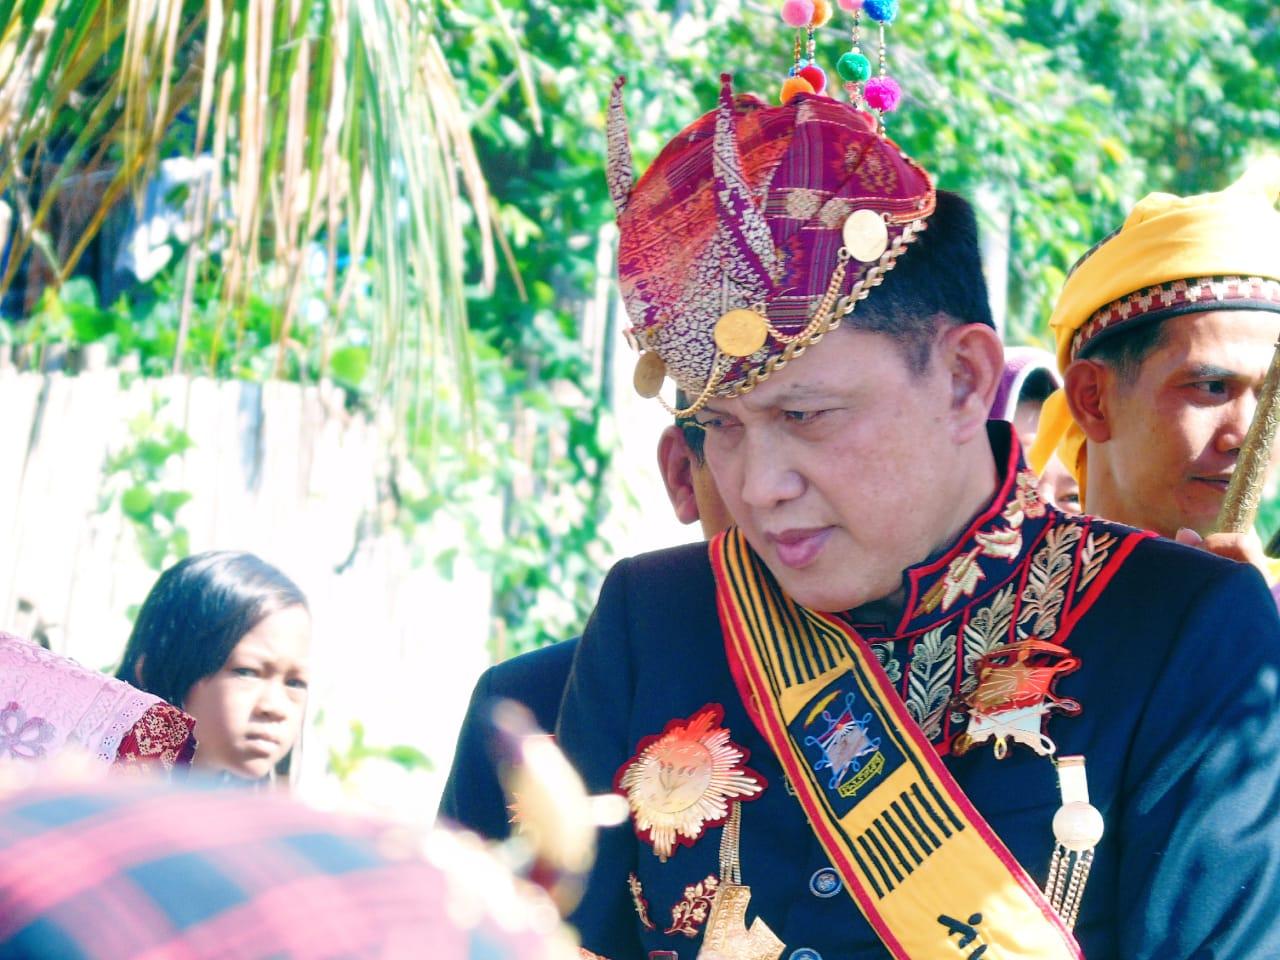 Sultan Skala Brak Doakan Alm HJ Putri Nurul Aini